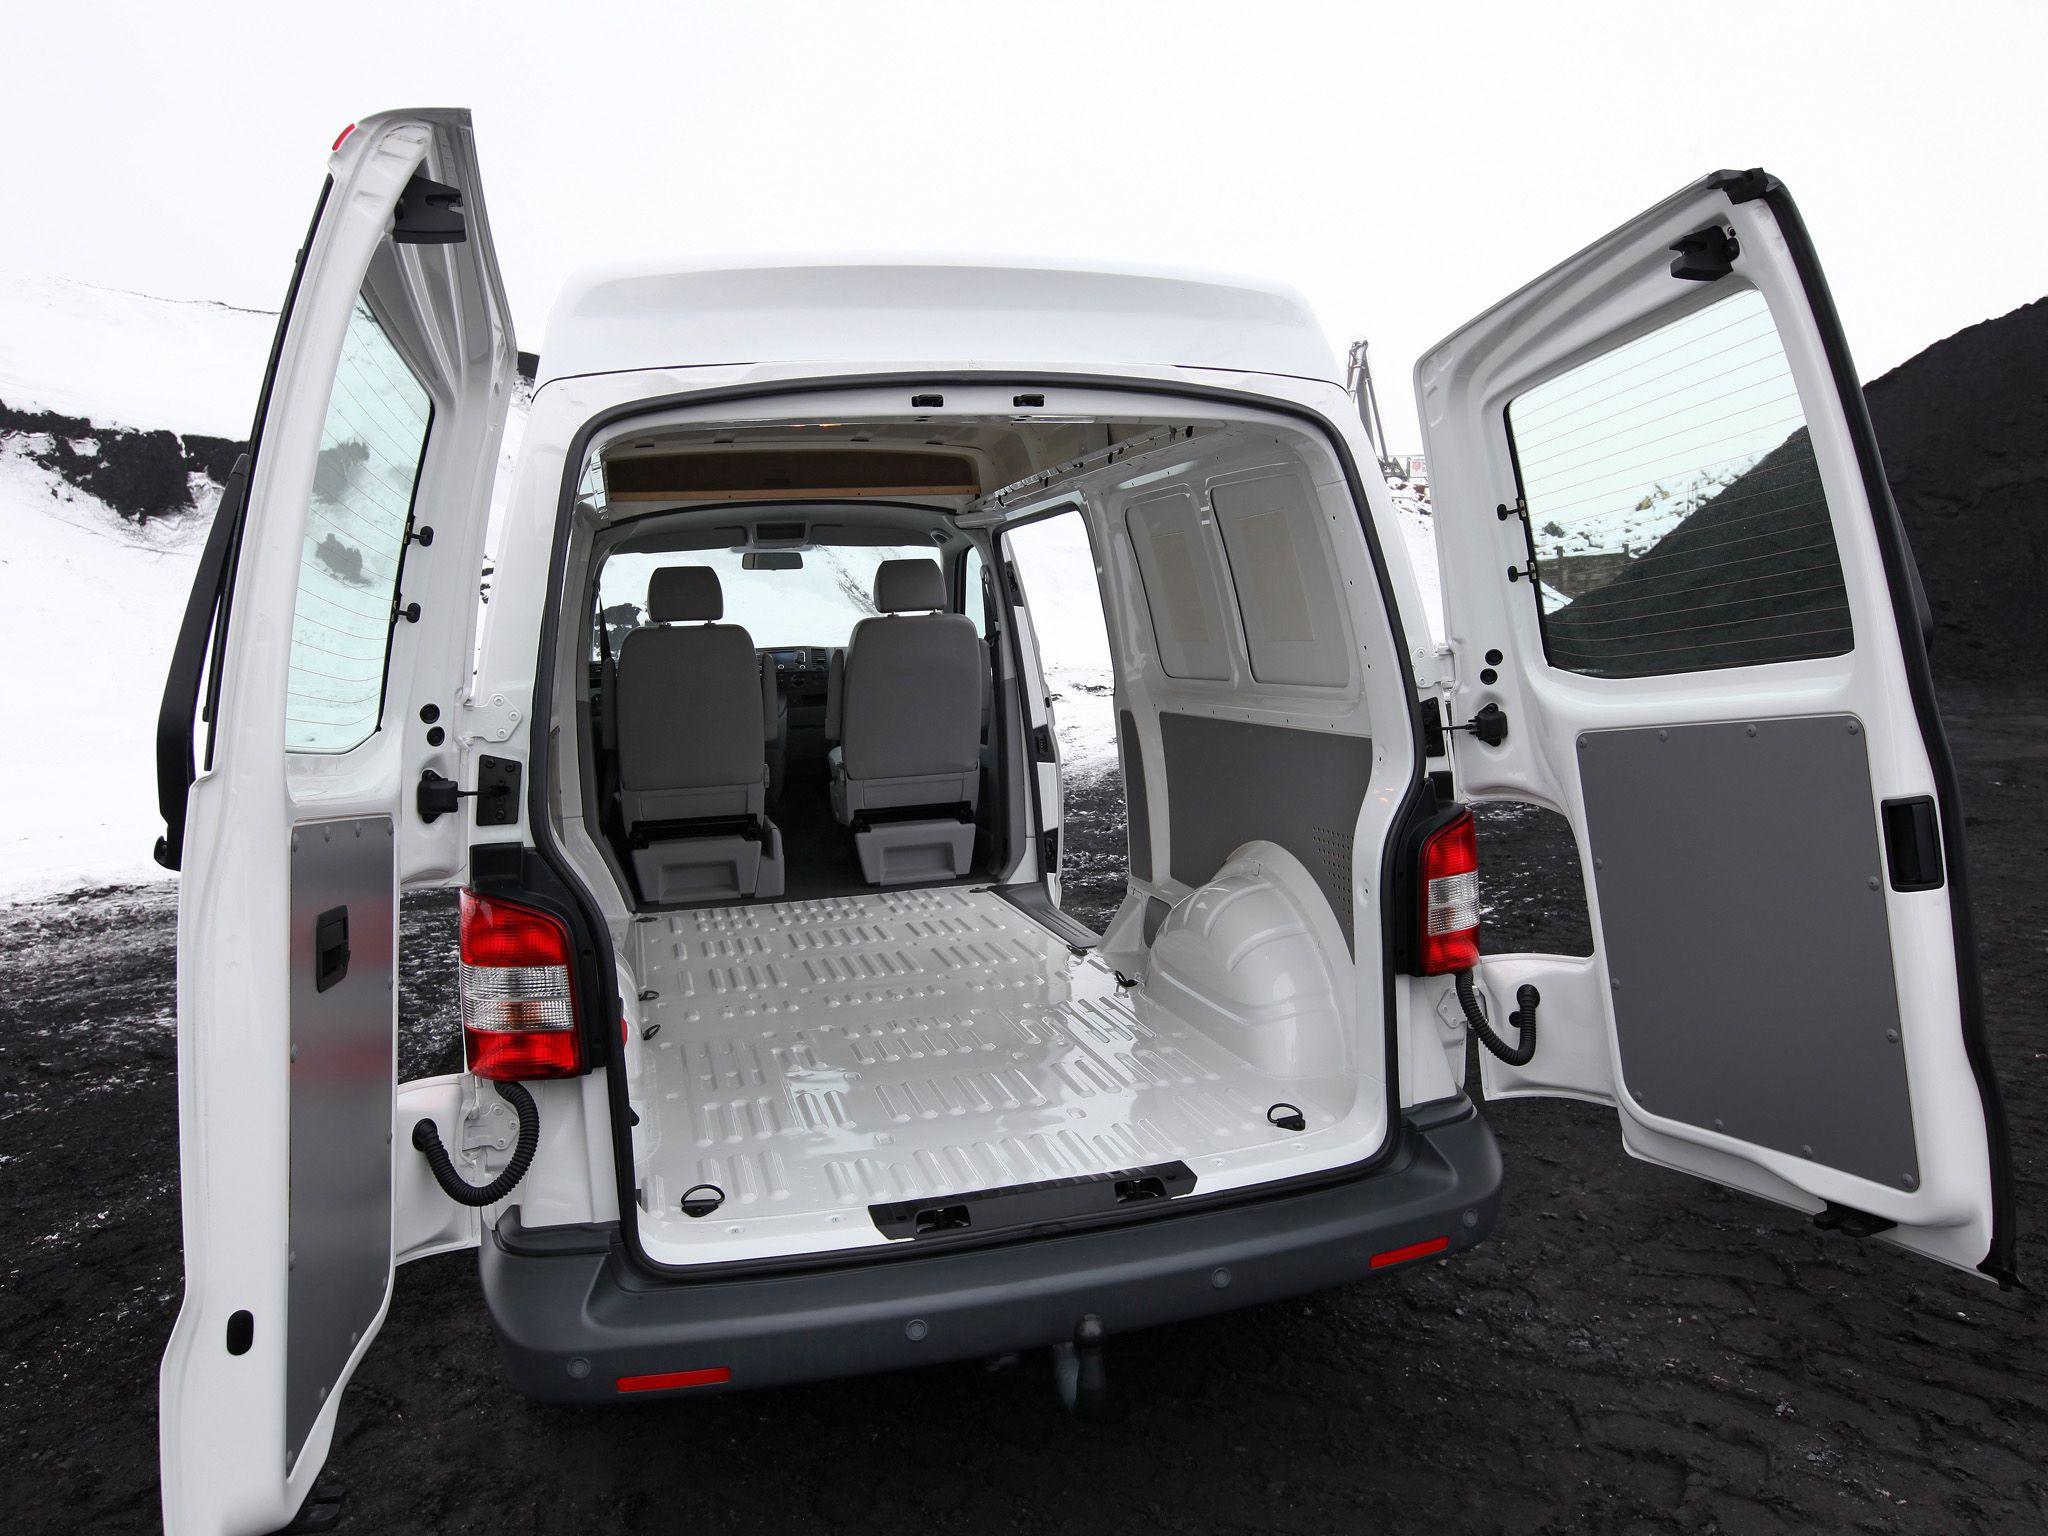 interior volkswagen transporter van medium high roof t5 39 2009 pr van life pinterest. Black Bedroom Furniture Sets. Home Design Ideas